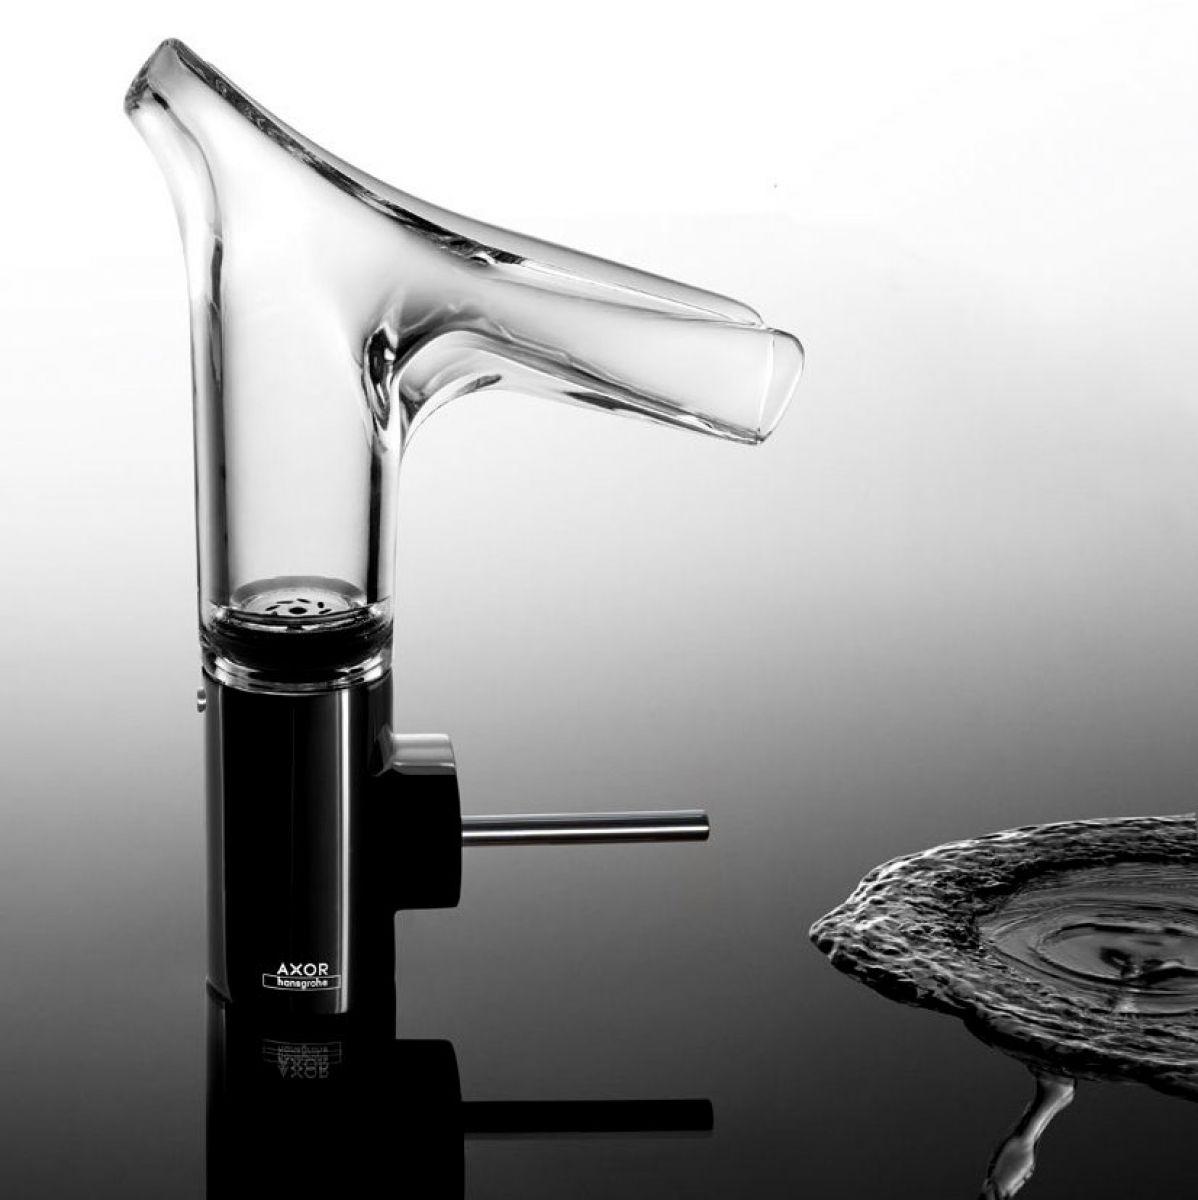 axor starck v glass spout basin mixer 140 uk bathrooms. Black Bedroom Furniture Sets. Home Design Ideas